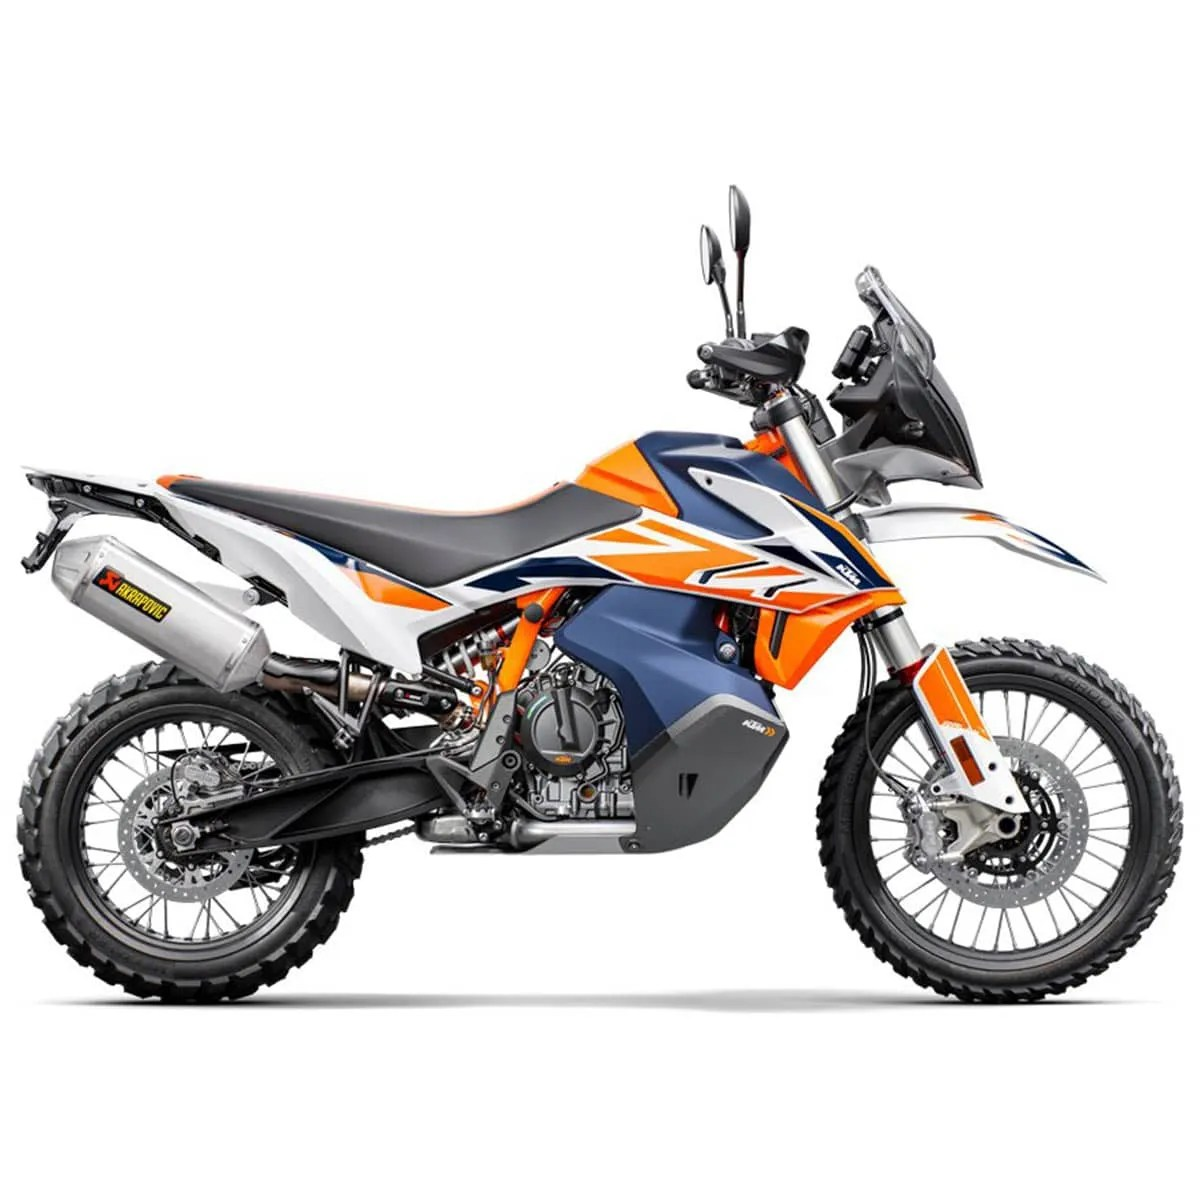 KTM-790-Adventure-R-Rally-2020